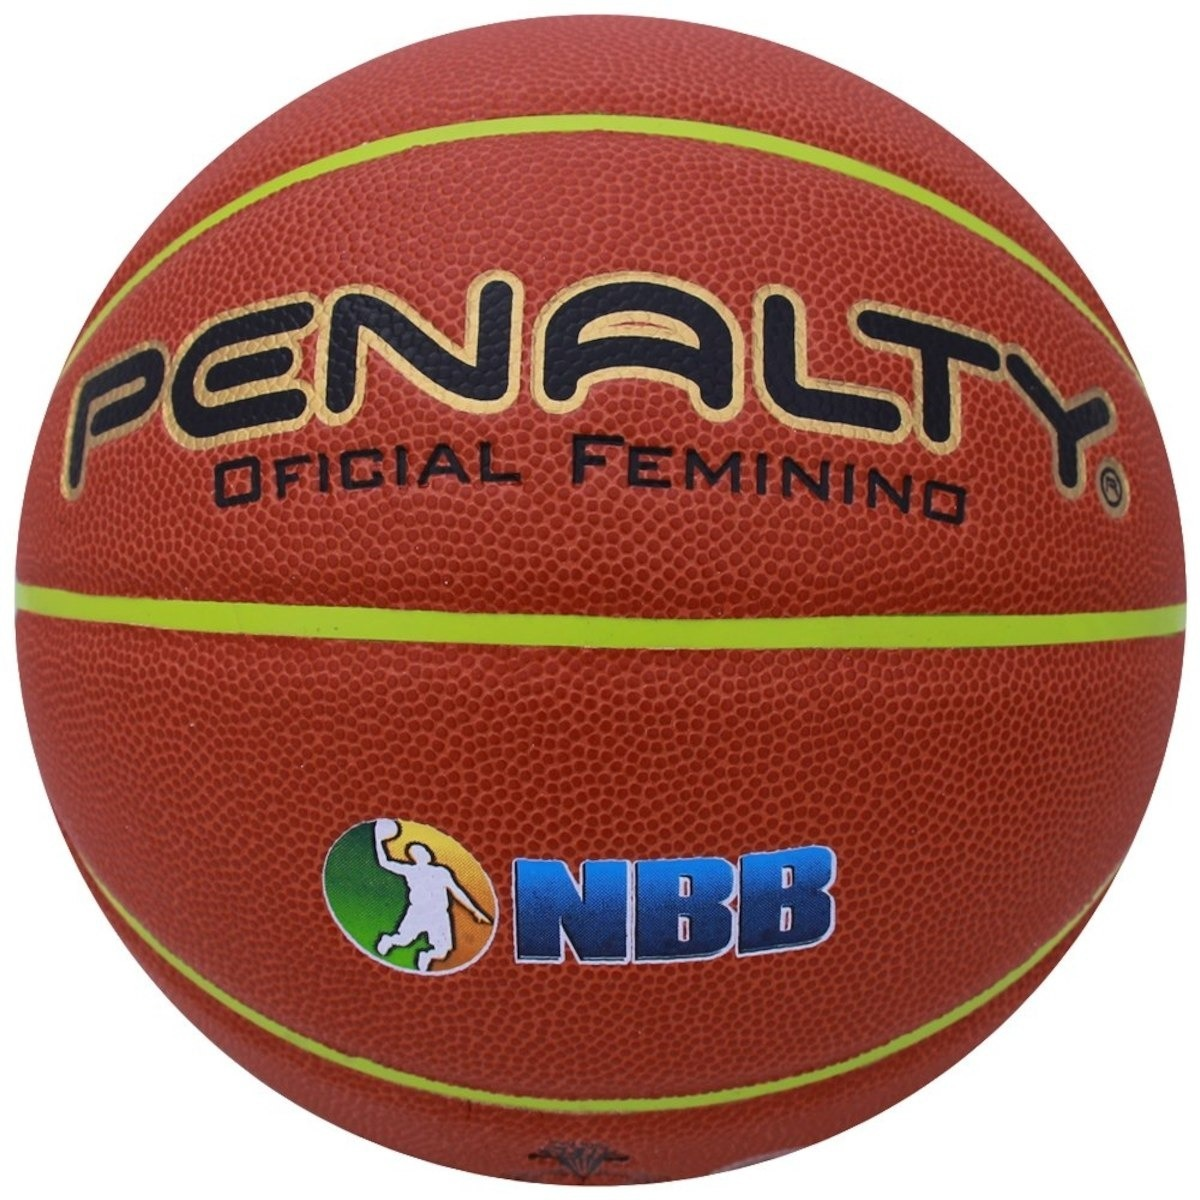 bola basquete penalty crossover 6.7 pro feminino oficial. Carregando zoom. 7121ba5c179f1